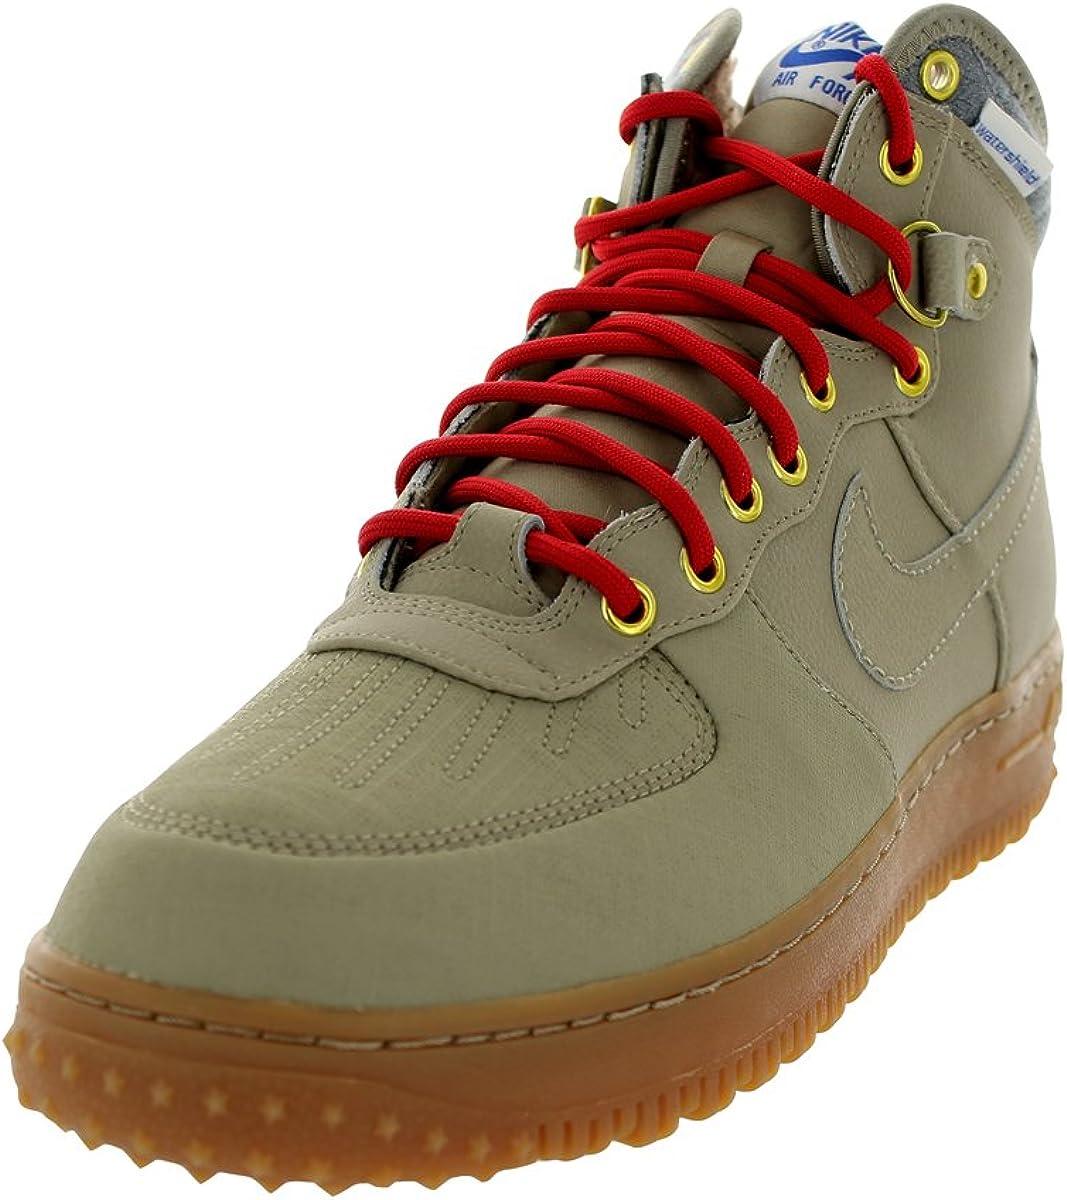 Nike Air Force 1 Duckboot Leder Wasserdicht Beige 444745 203